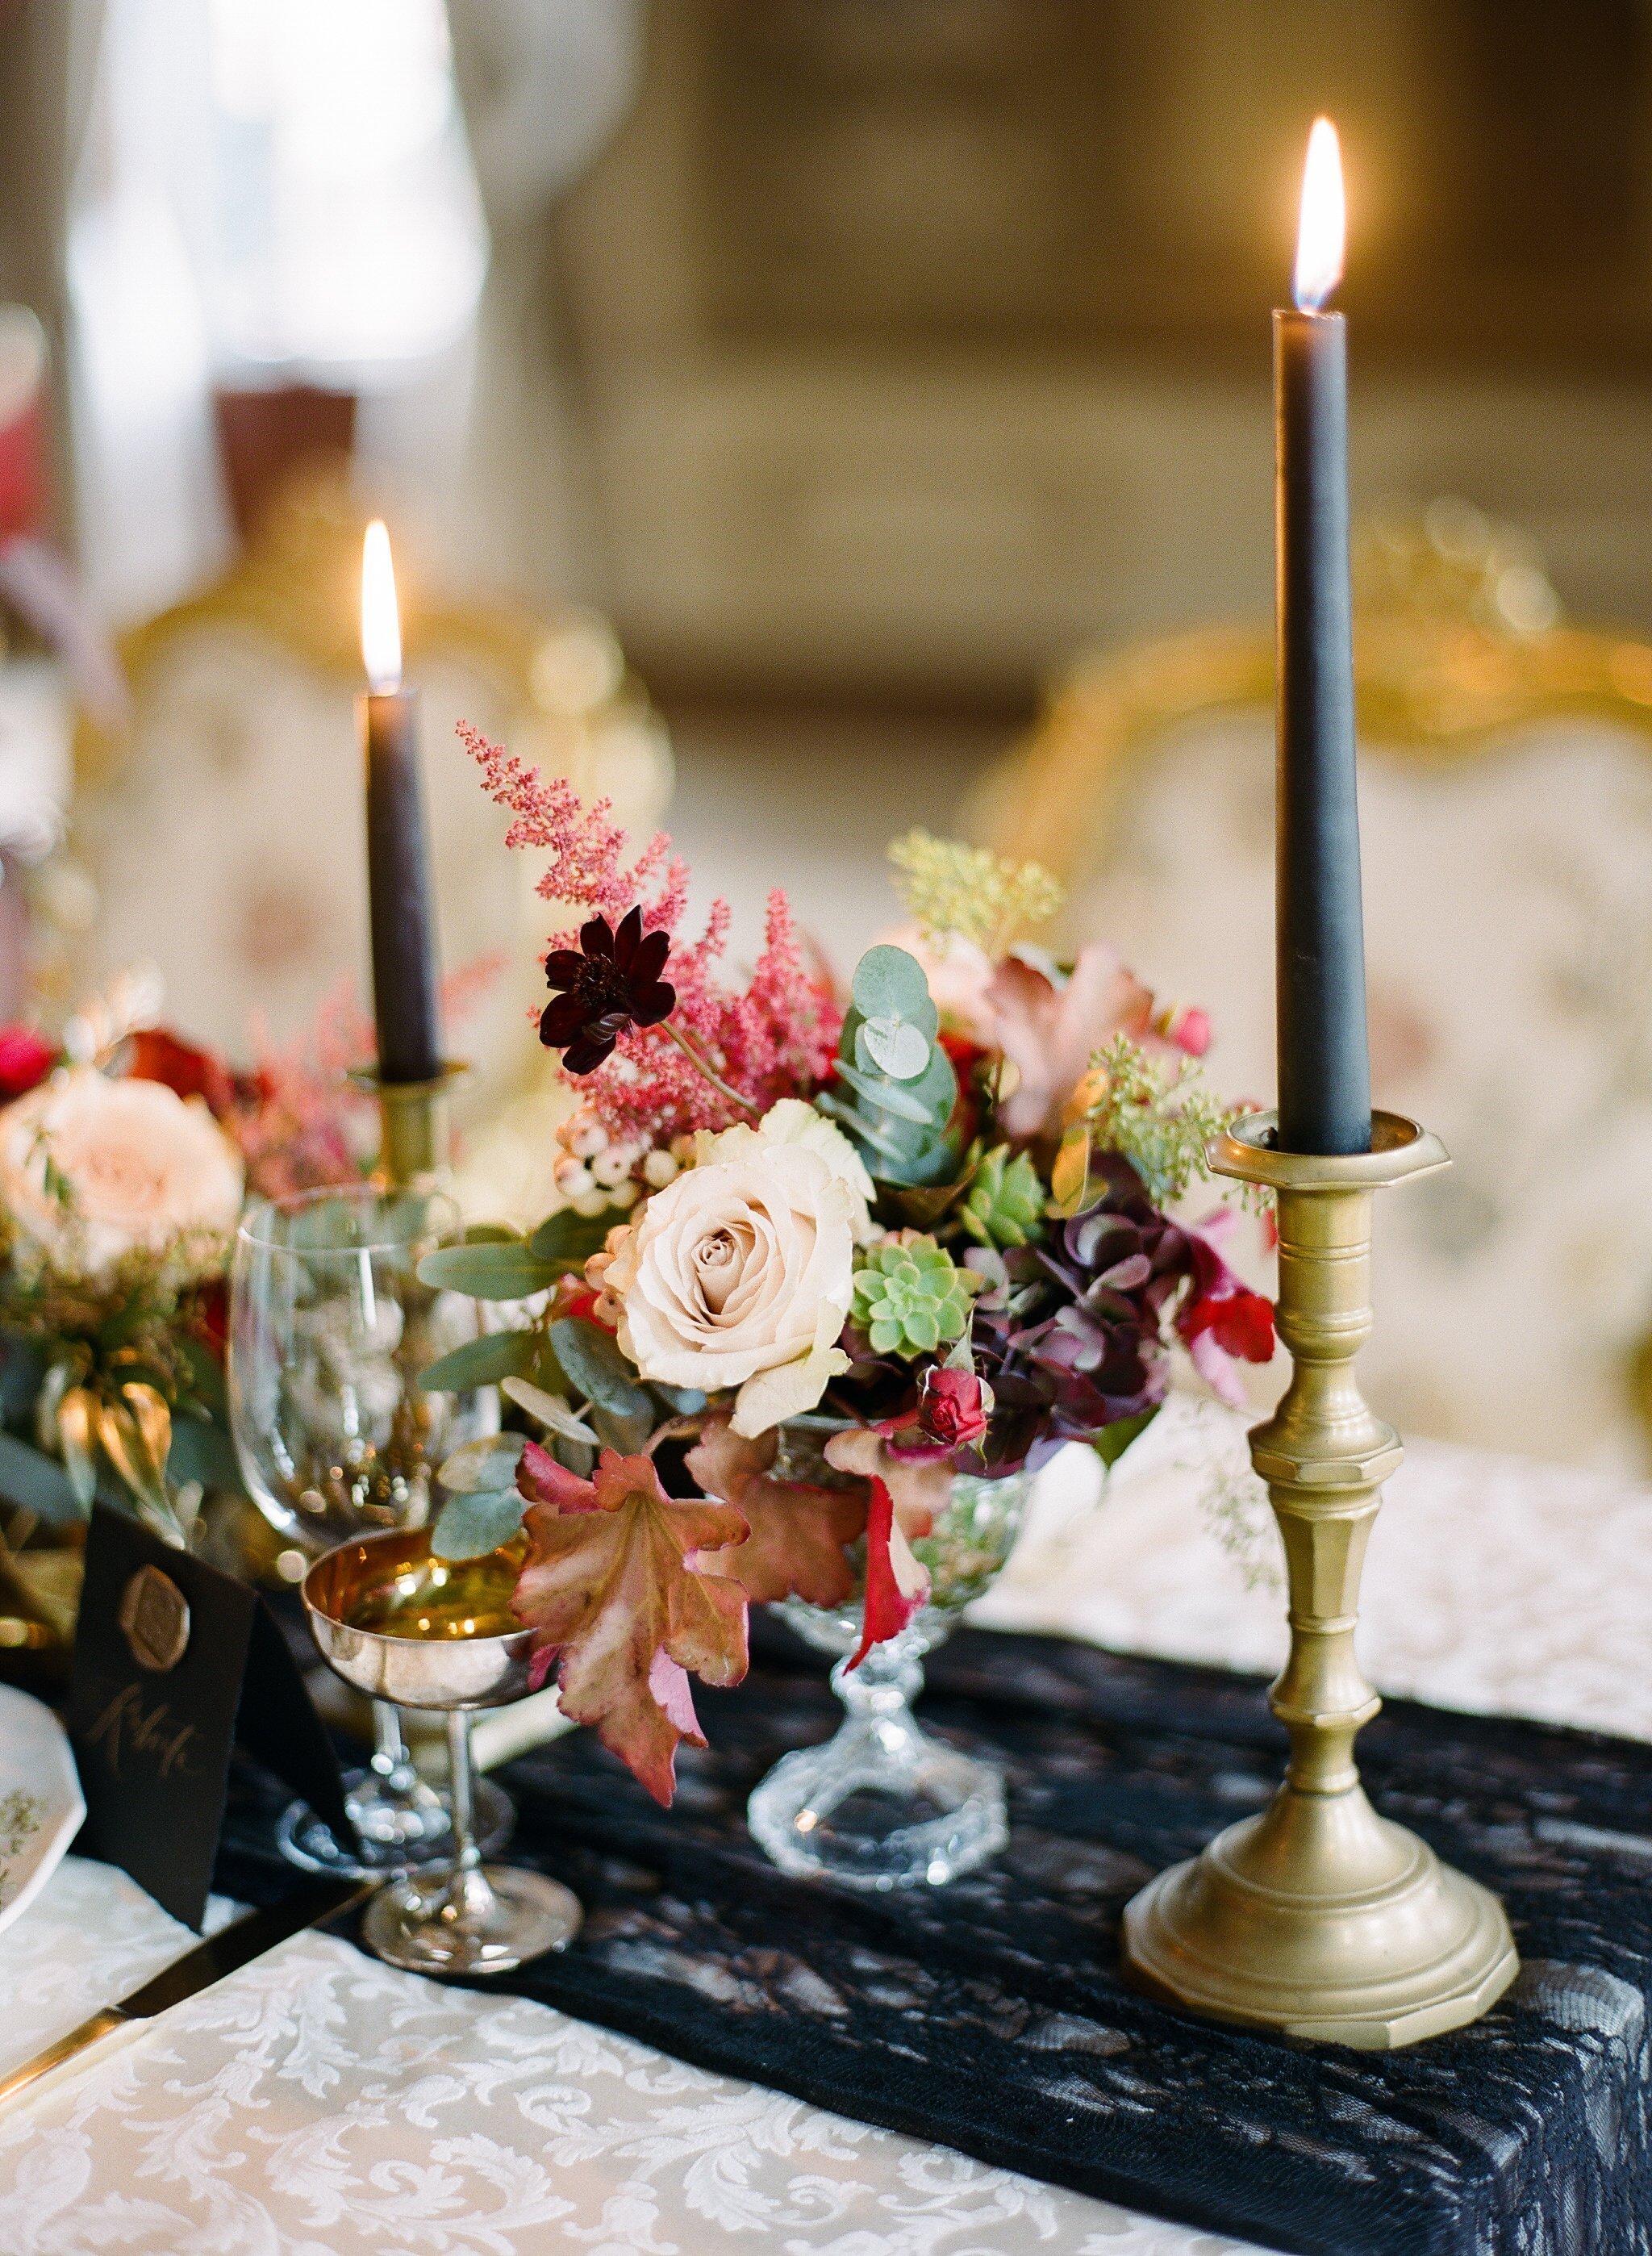 italy-venice-elopement-wedding-planner-flower-designer-120